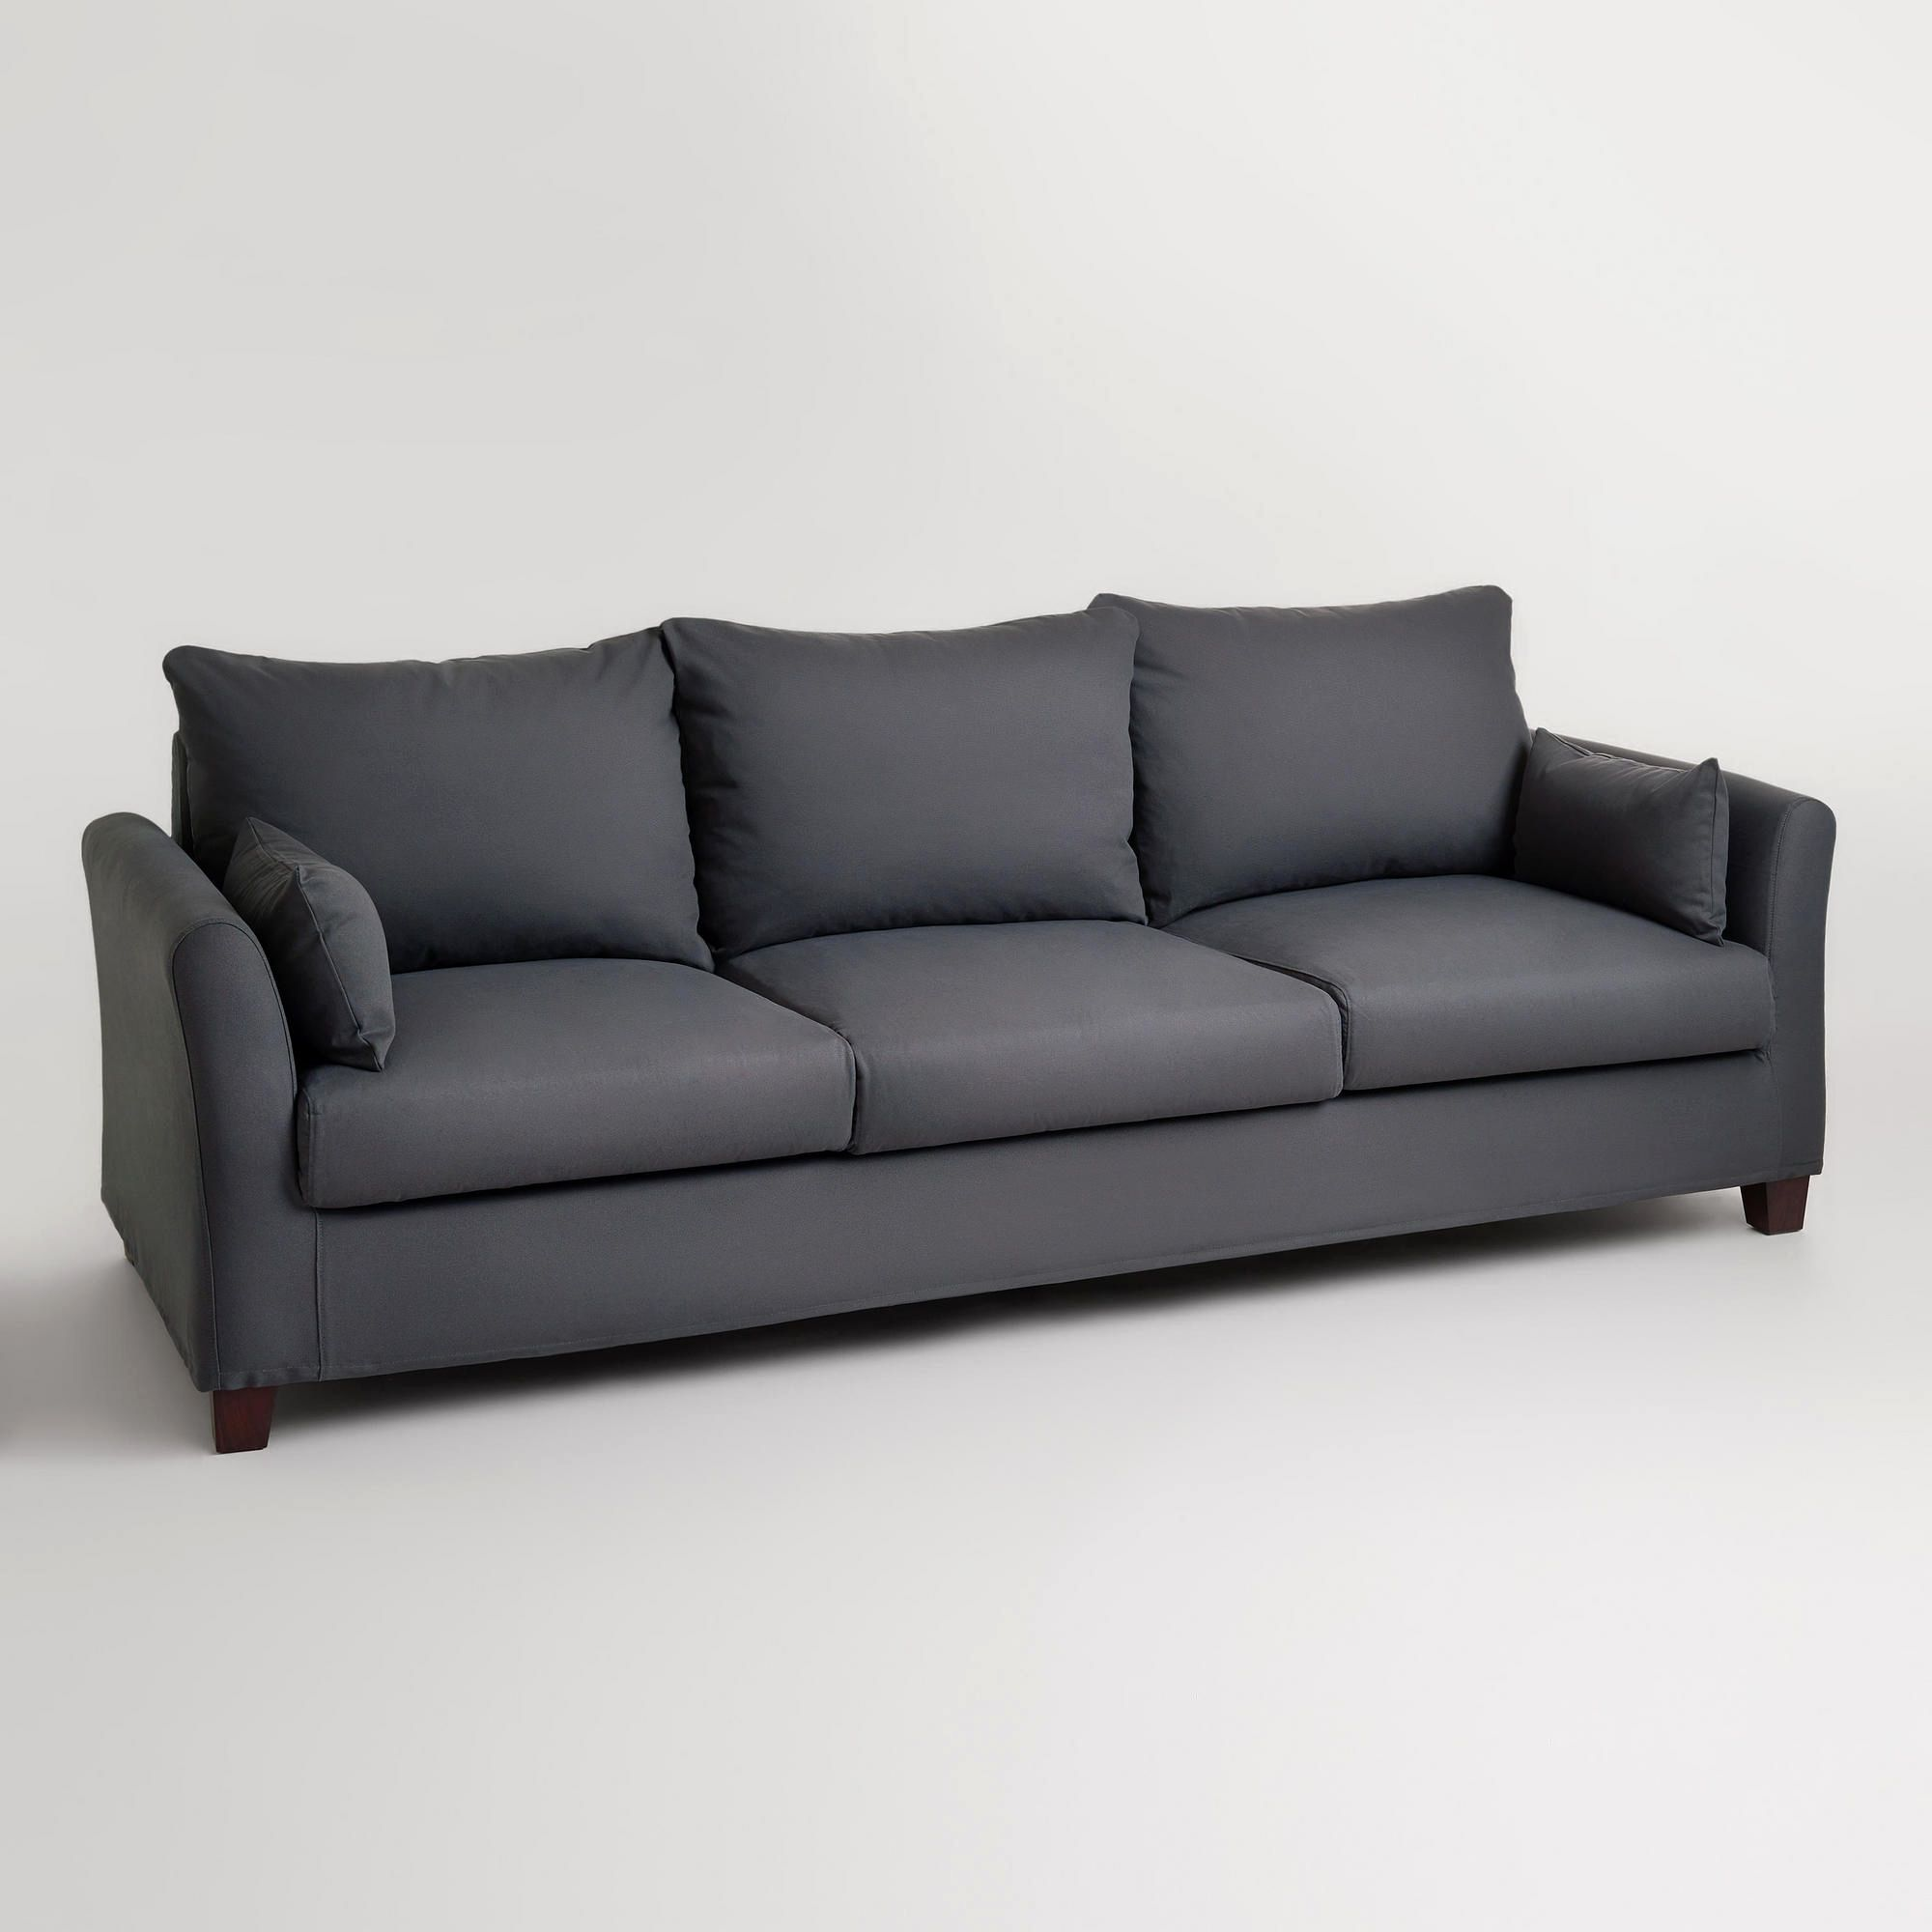 Unique 3 Seat Sofa Cover Picture Charcoal Canvas Luxe 3 Seat Sofa Slipcover  Sofa Slipcovers